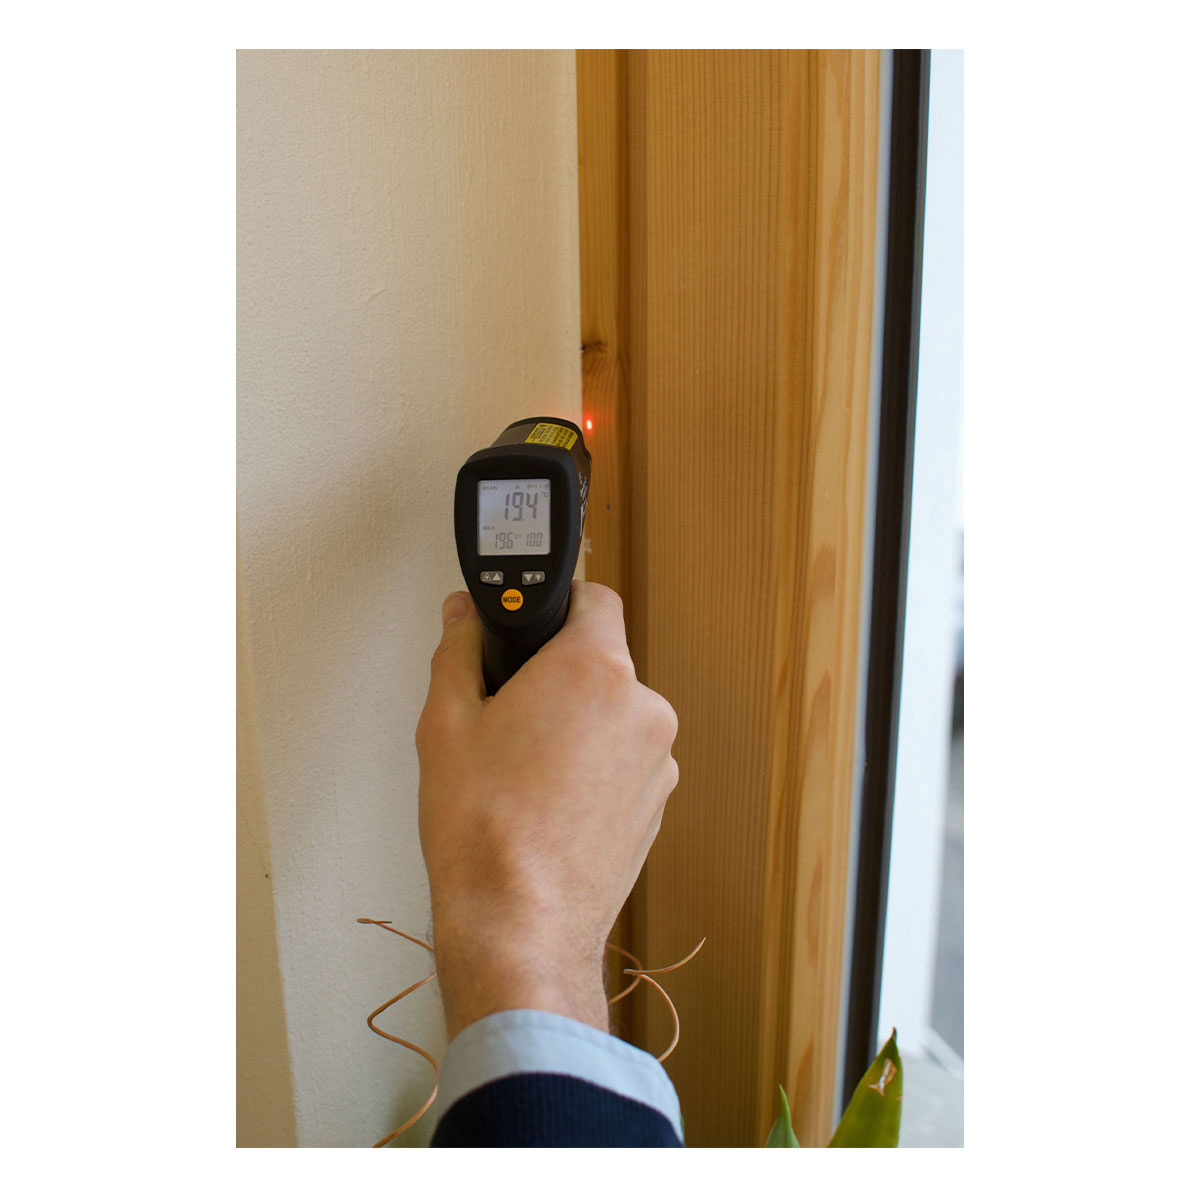 31-1124-infrarot-thermometer-scantemp-485-anwendung2-1200x1200px.jpg